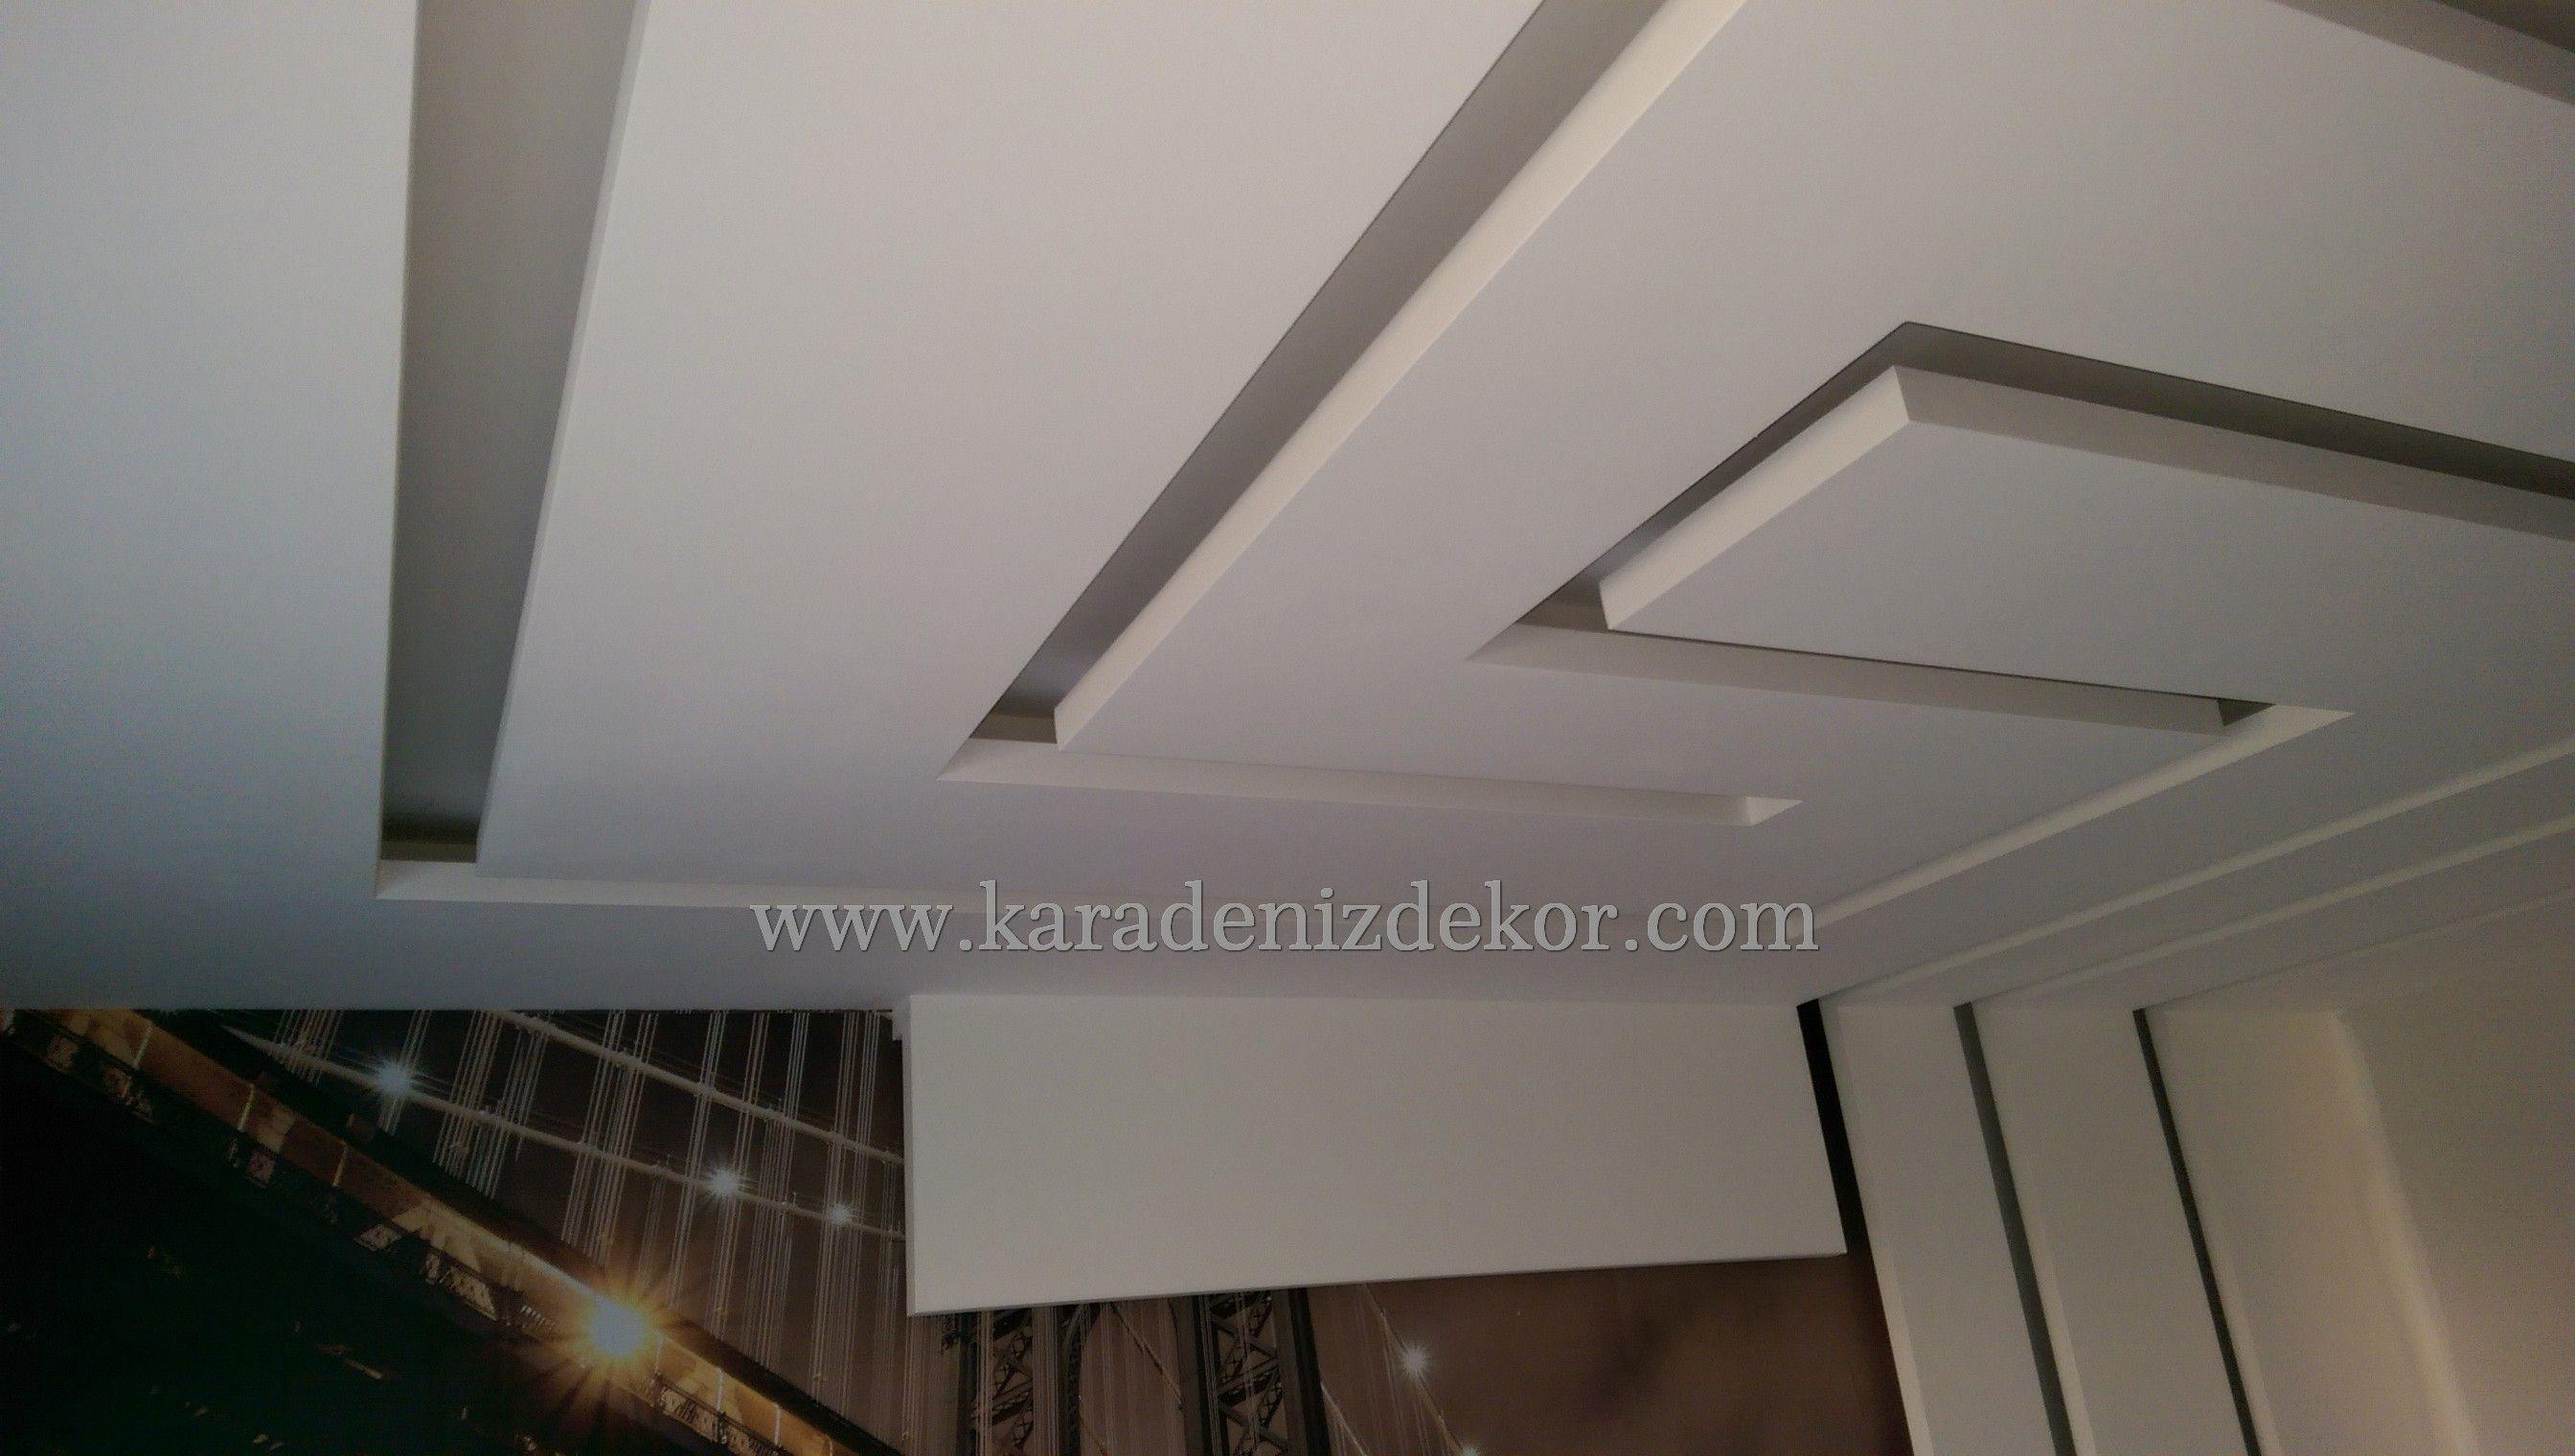 Wwwkaradenizdekorcom Images Imag0455 Ceiling Designceilingsroof Designblankets